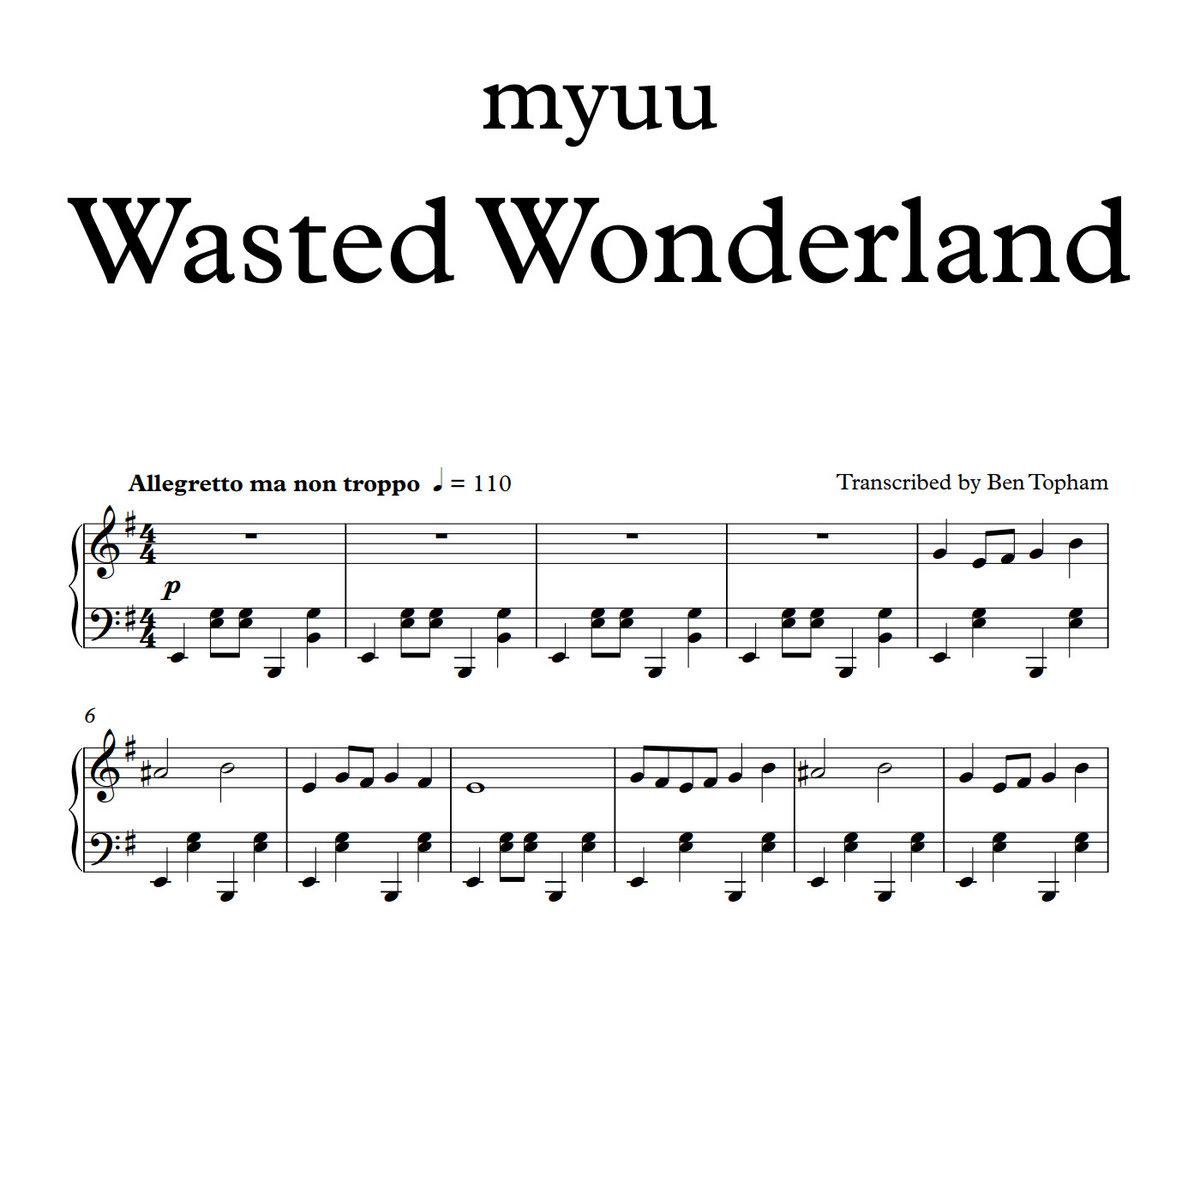 Perfect Ed Sheeran Piano Sheet Music With Lyrics: Ode To Joy Easy Sheet Music Free Piano Sheets T Music